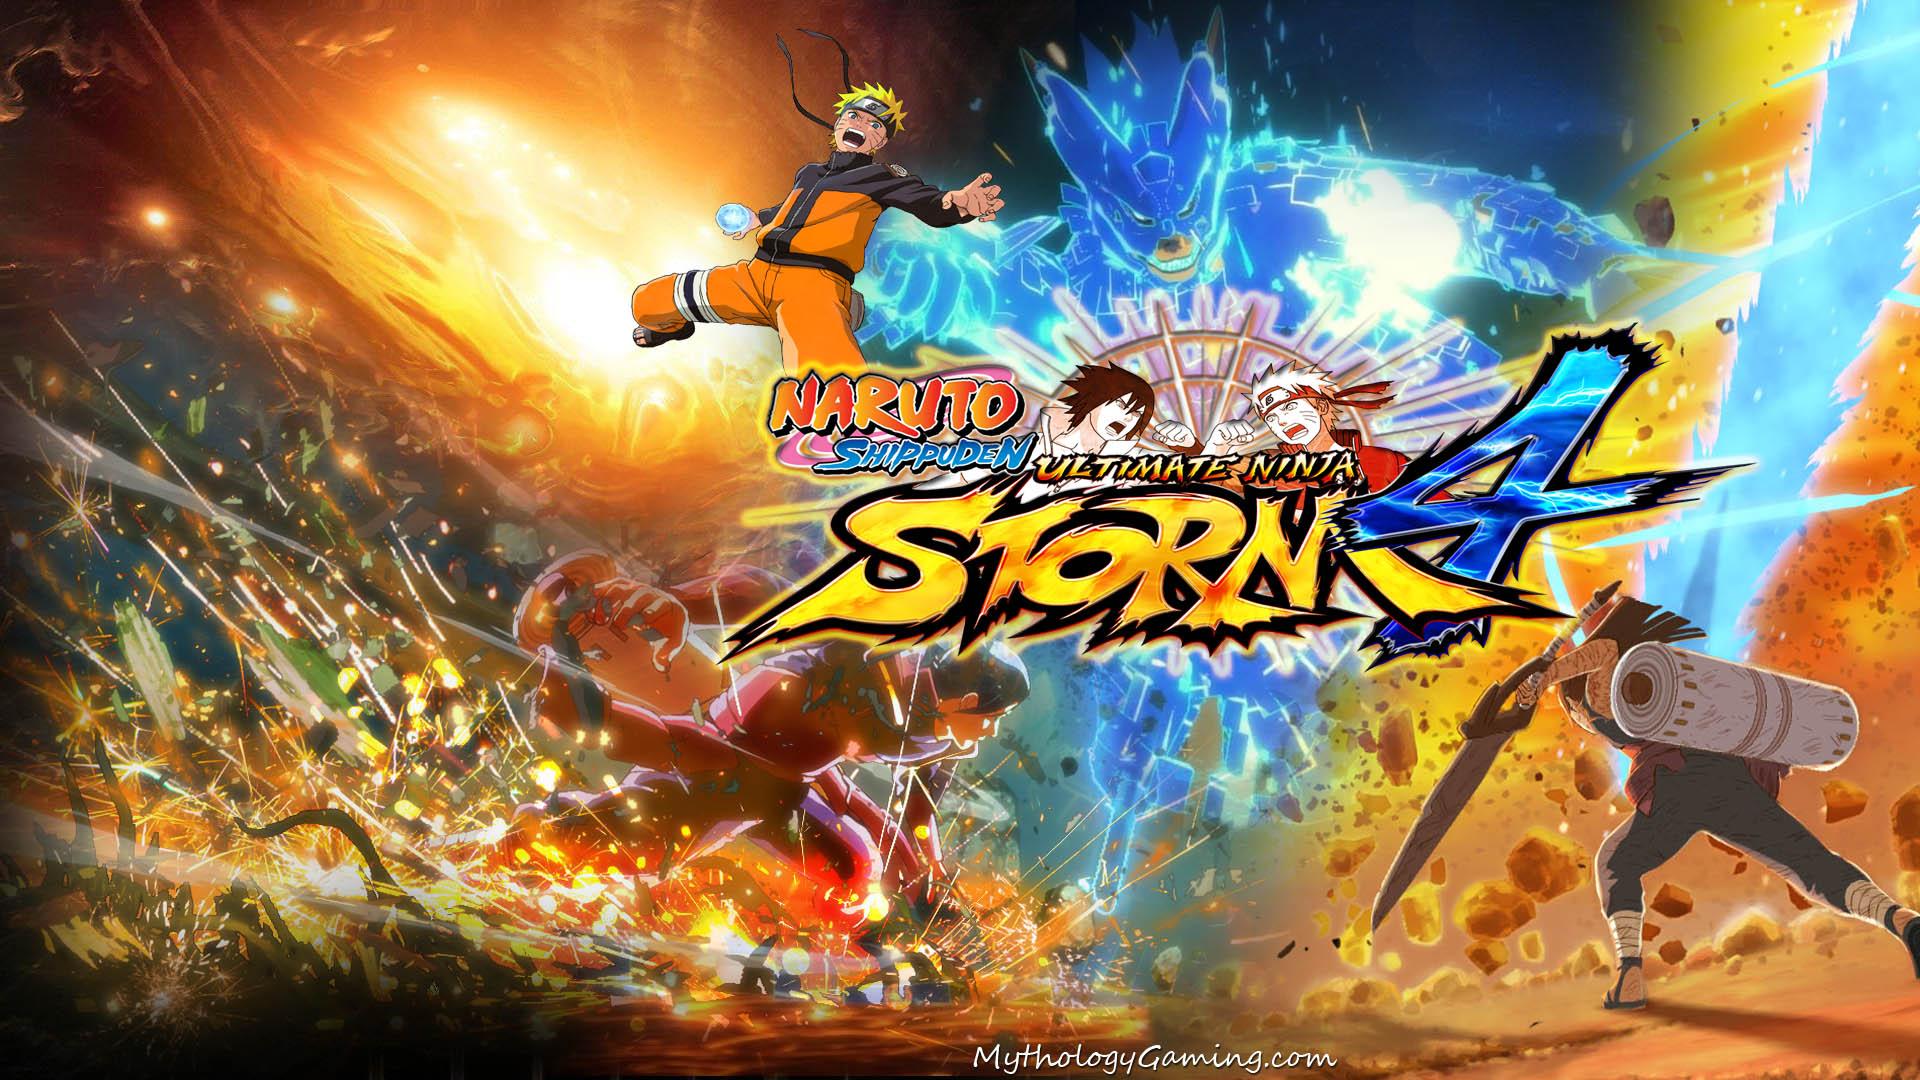 Free Download Naruto Shippuden Ultimate Ninja Storm 4 Ps4